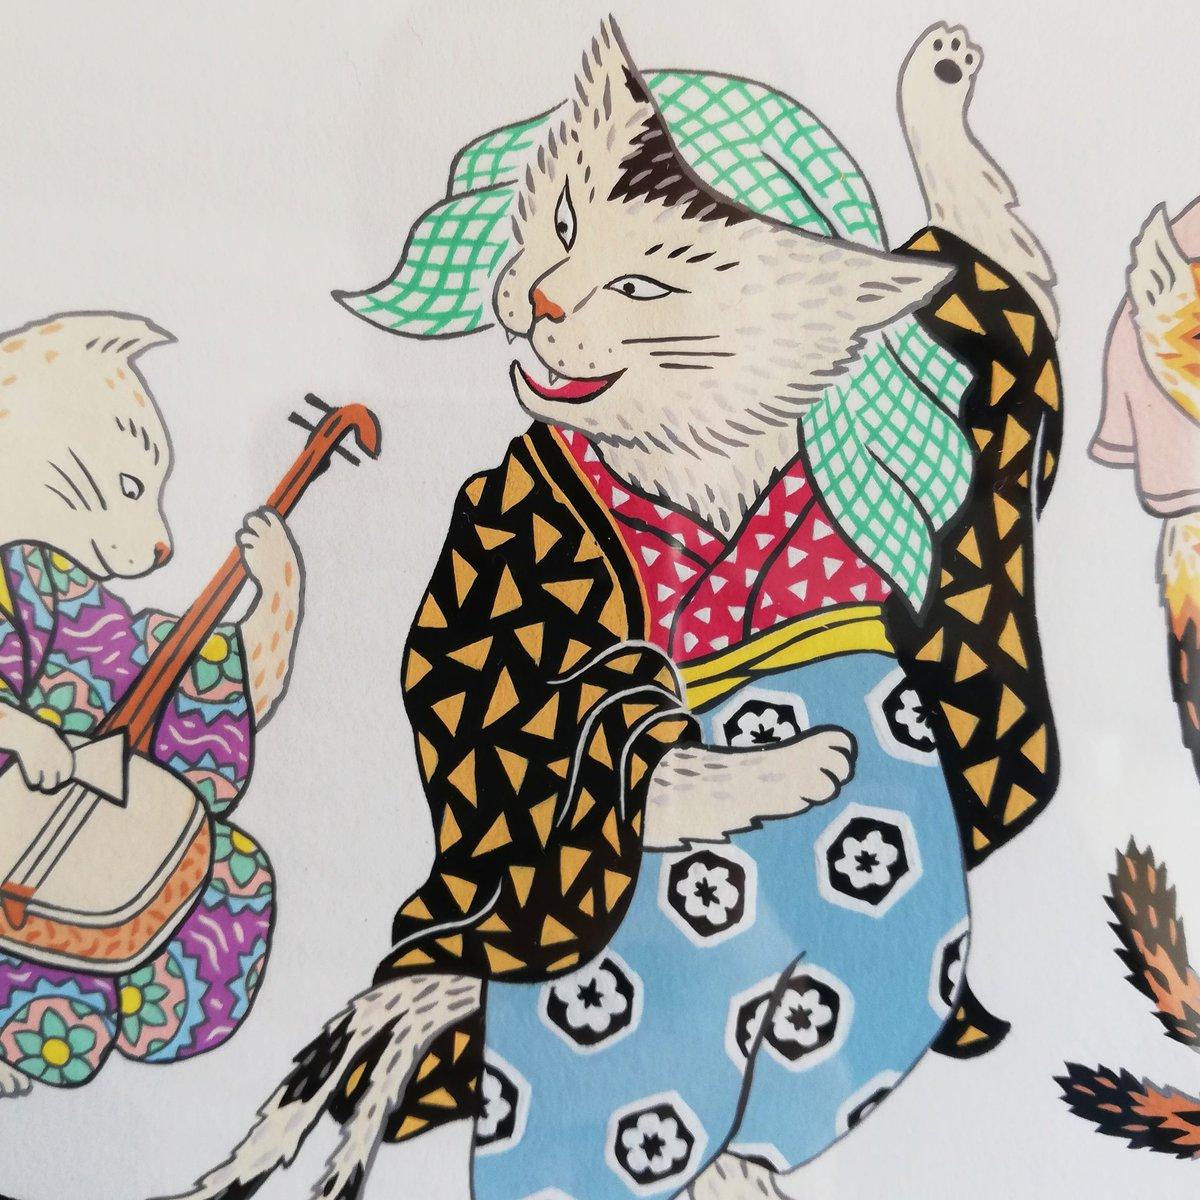 Bakeneko (detail):#SandrineThommen の #ImagesduJapon 展示は5月11日から7月13日まで。:#exhibition #art #shinjuku #tokyo #japan #mimu #triplo #illustration #イラスト #トリプロ #クリエイティブラーニング英会話 #英会話 #新宿御苑前 #新宿 #アート #展示 #thommen